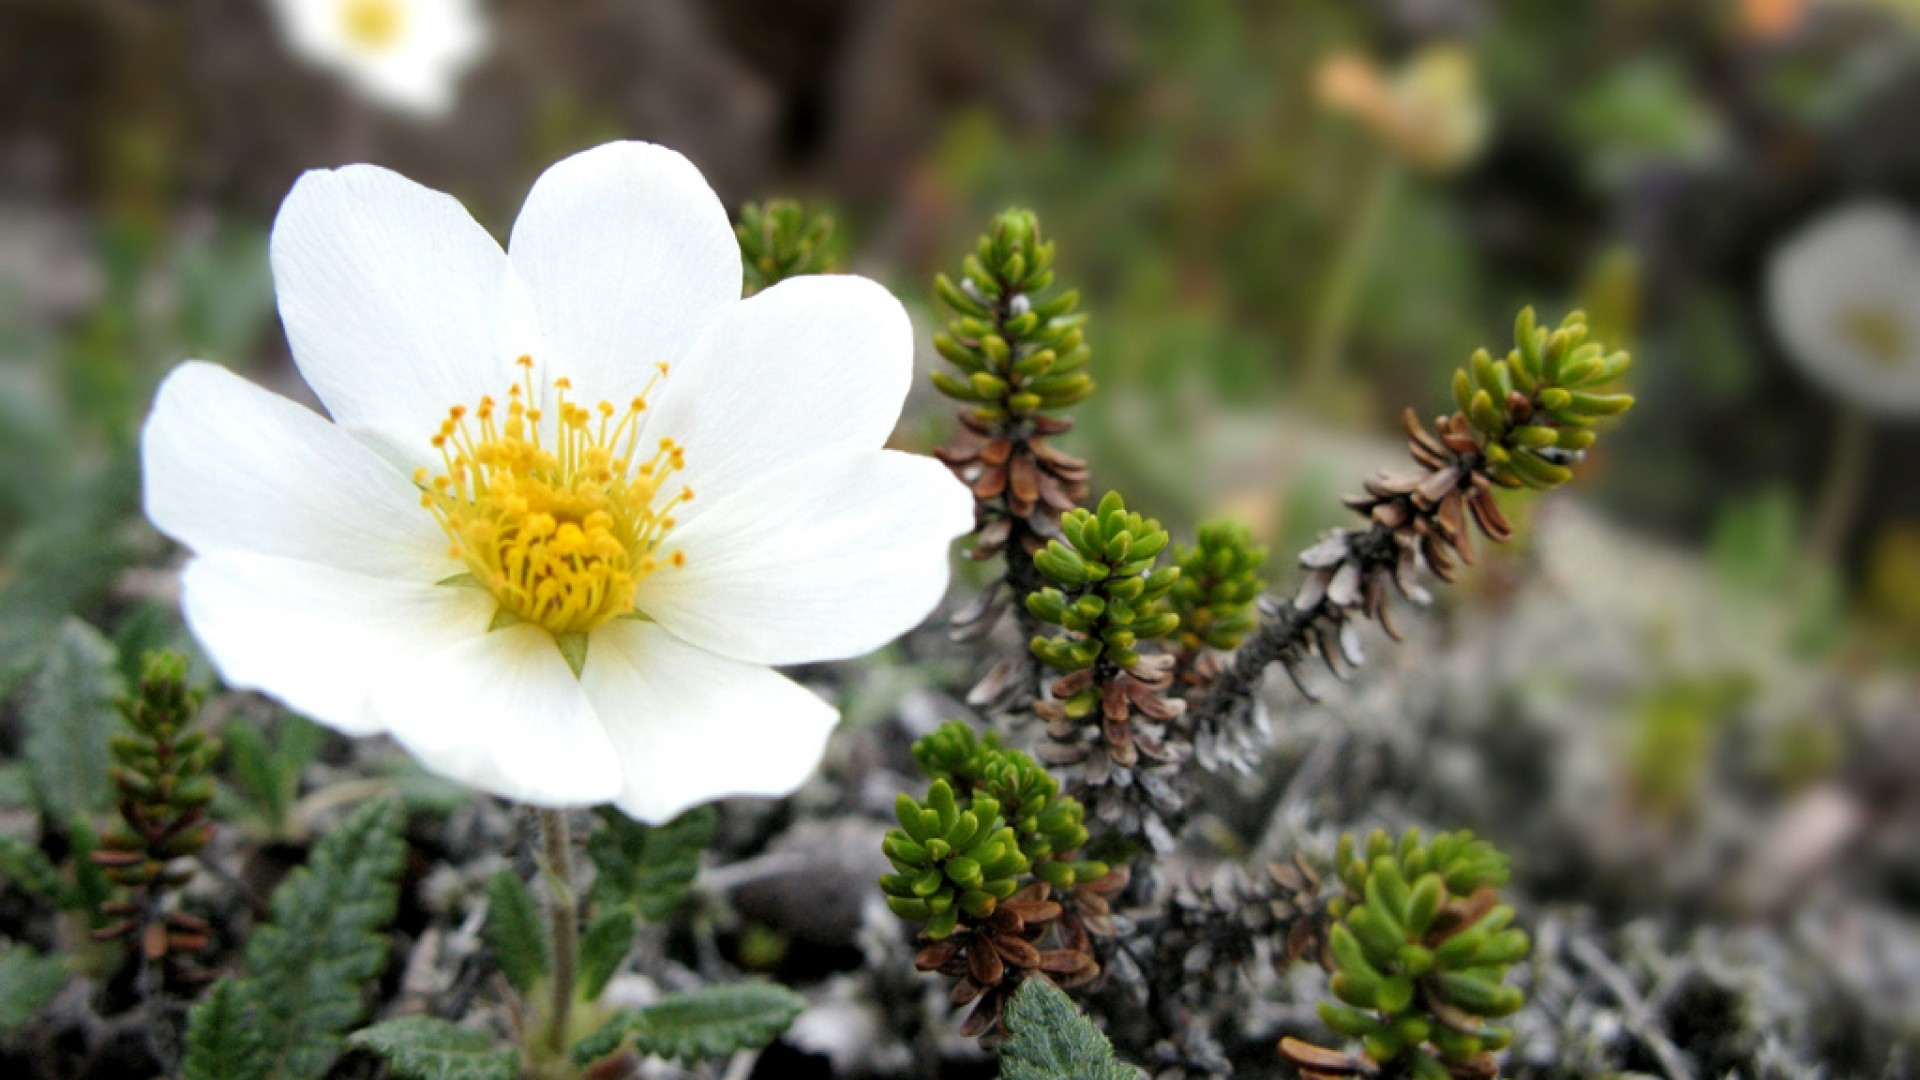 Flower-Green-Nature-White-Hd-Widescreen-Flowers-Flower-Green-Nature-White-Hd-W-wallpaper-wpc5804867